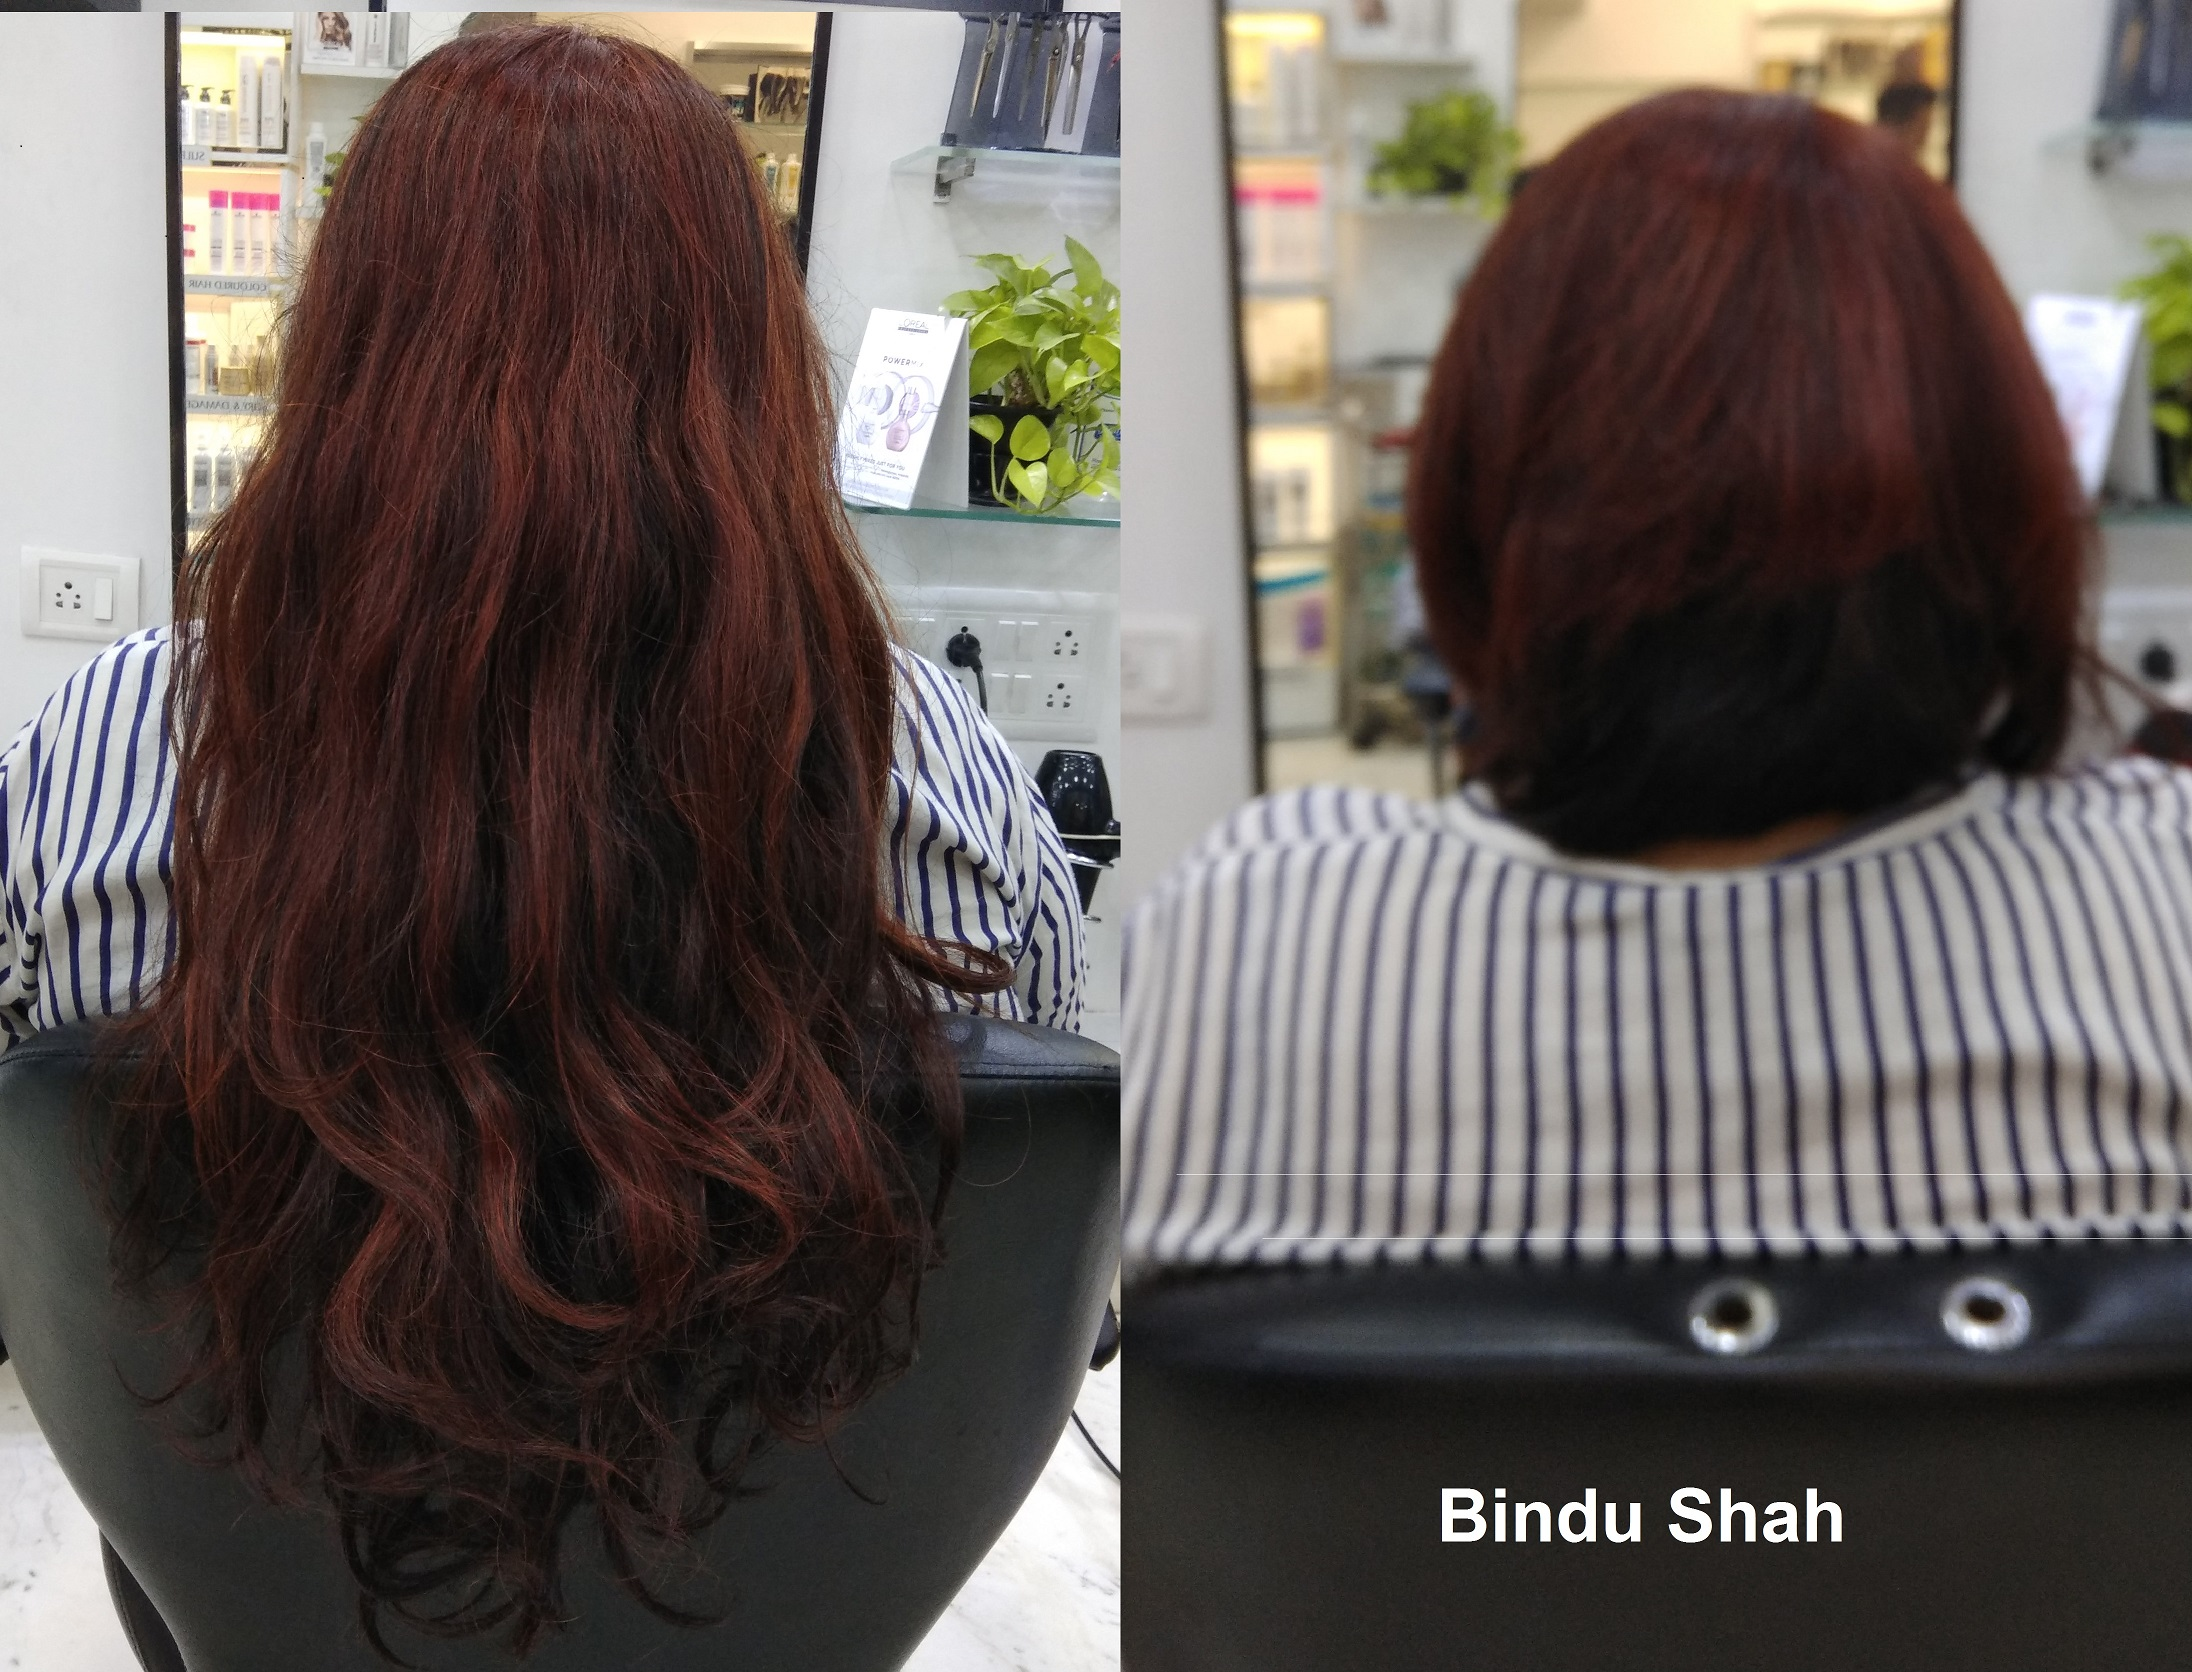 Bindu Shah